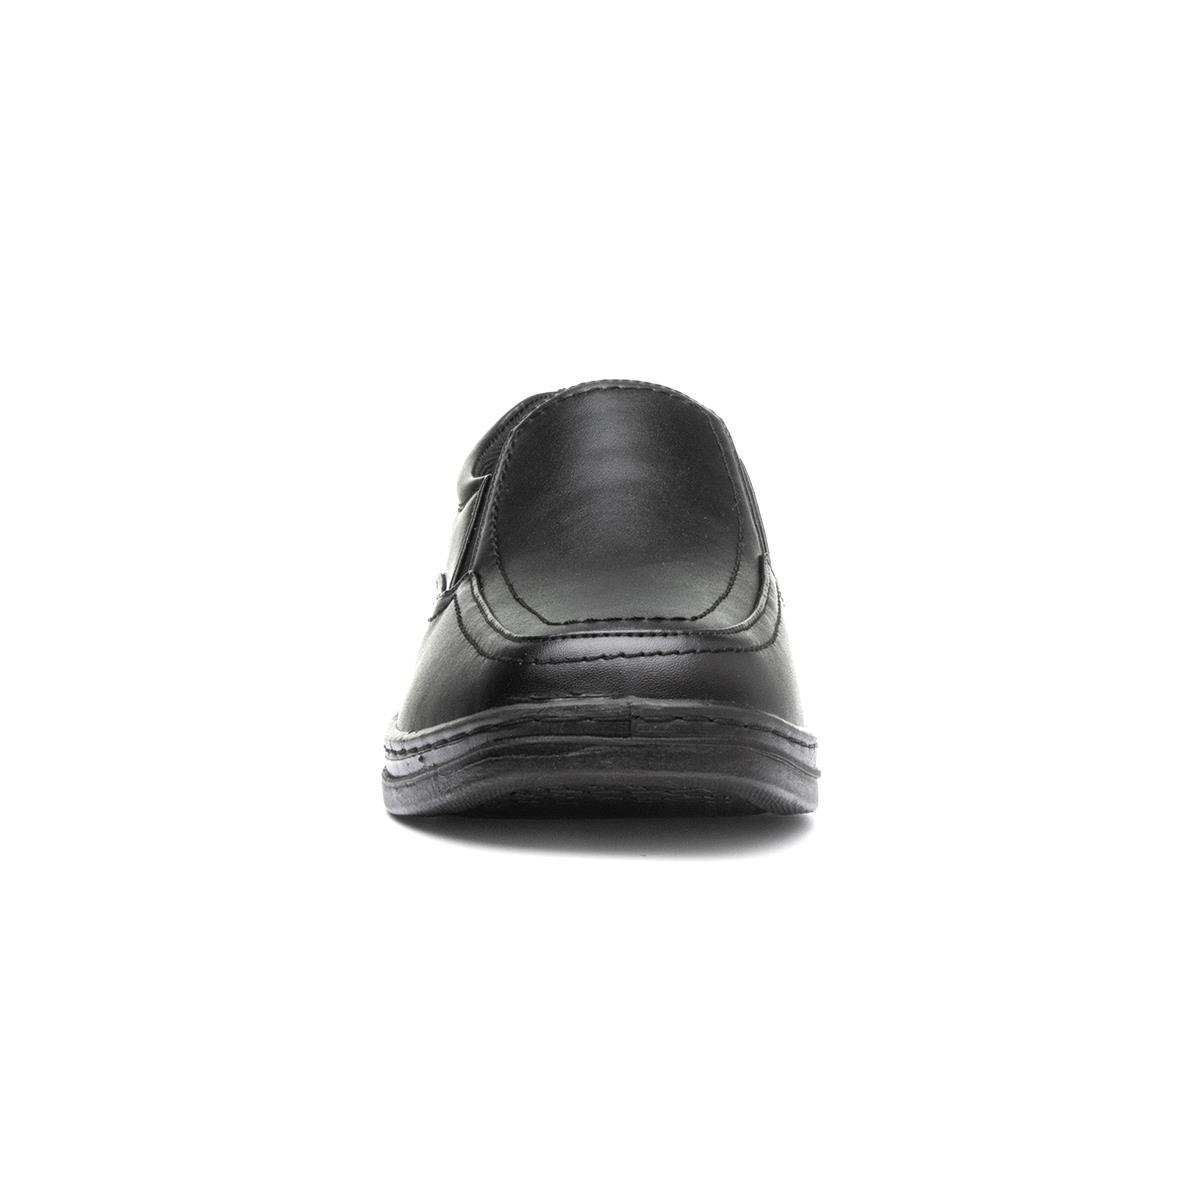 11803c93fa62 Hobos Mens Side Twin Gusset Shoe in Black-50218